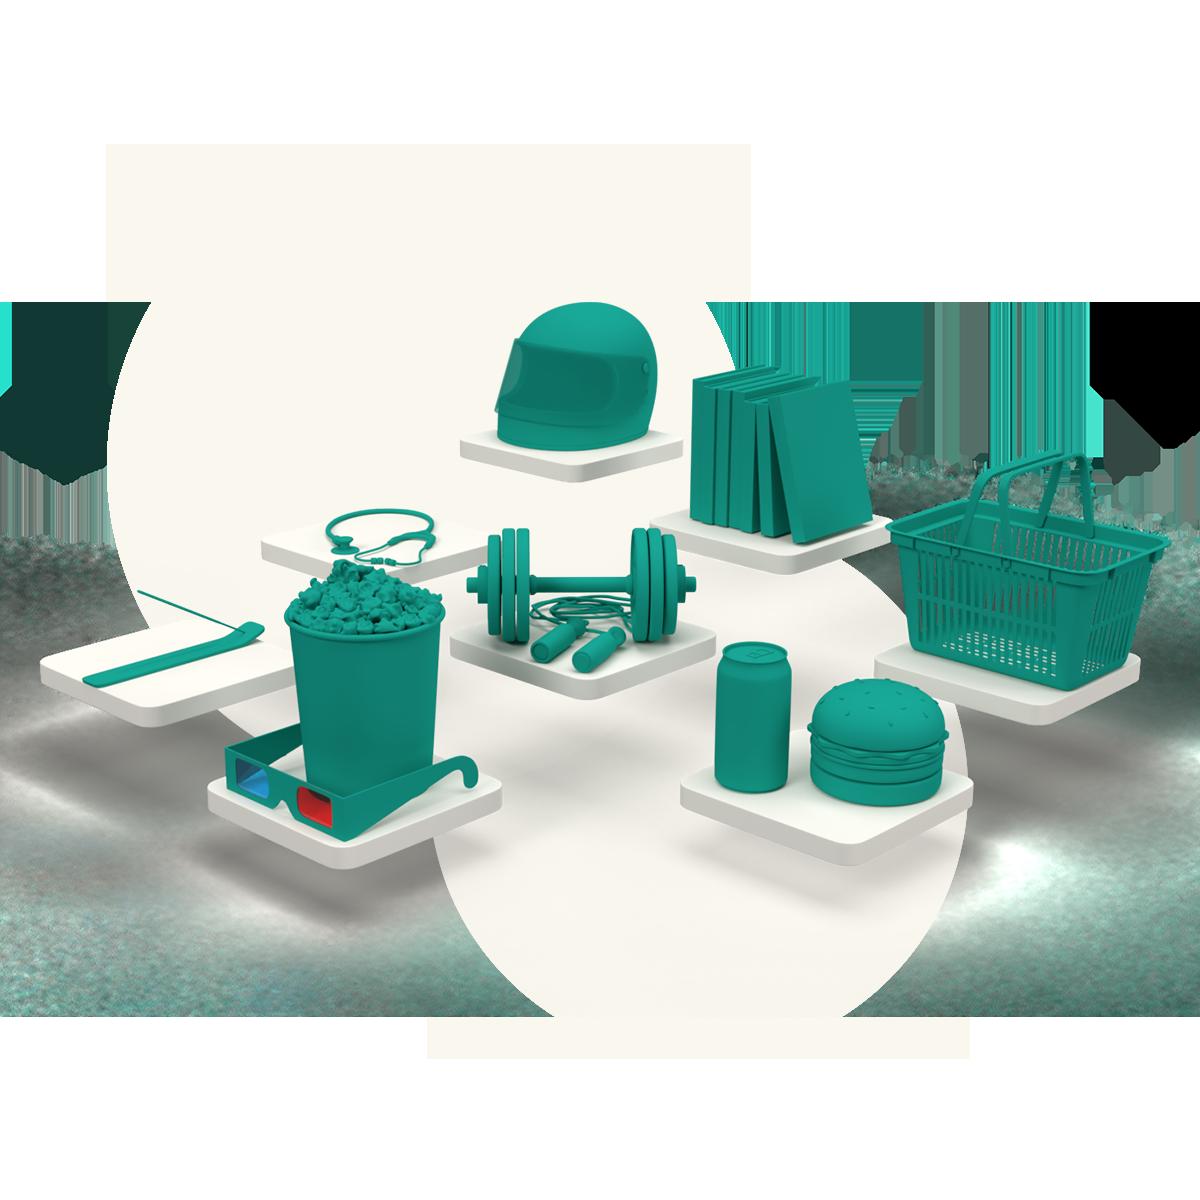 3D render of Alymente's benefits offer.